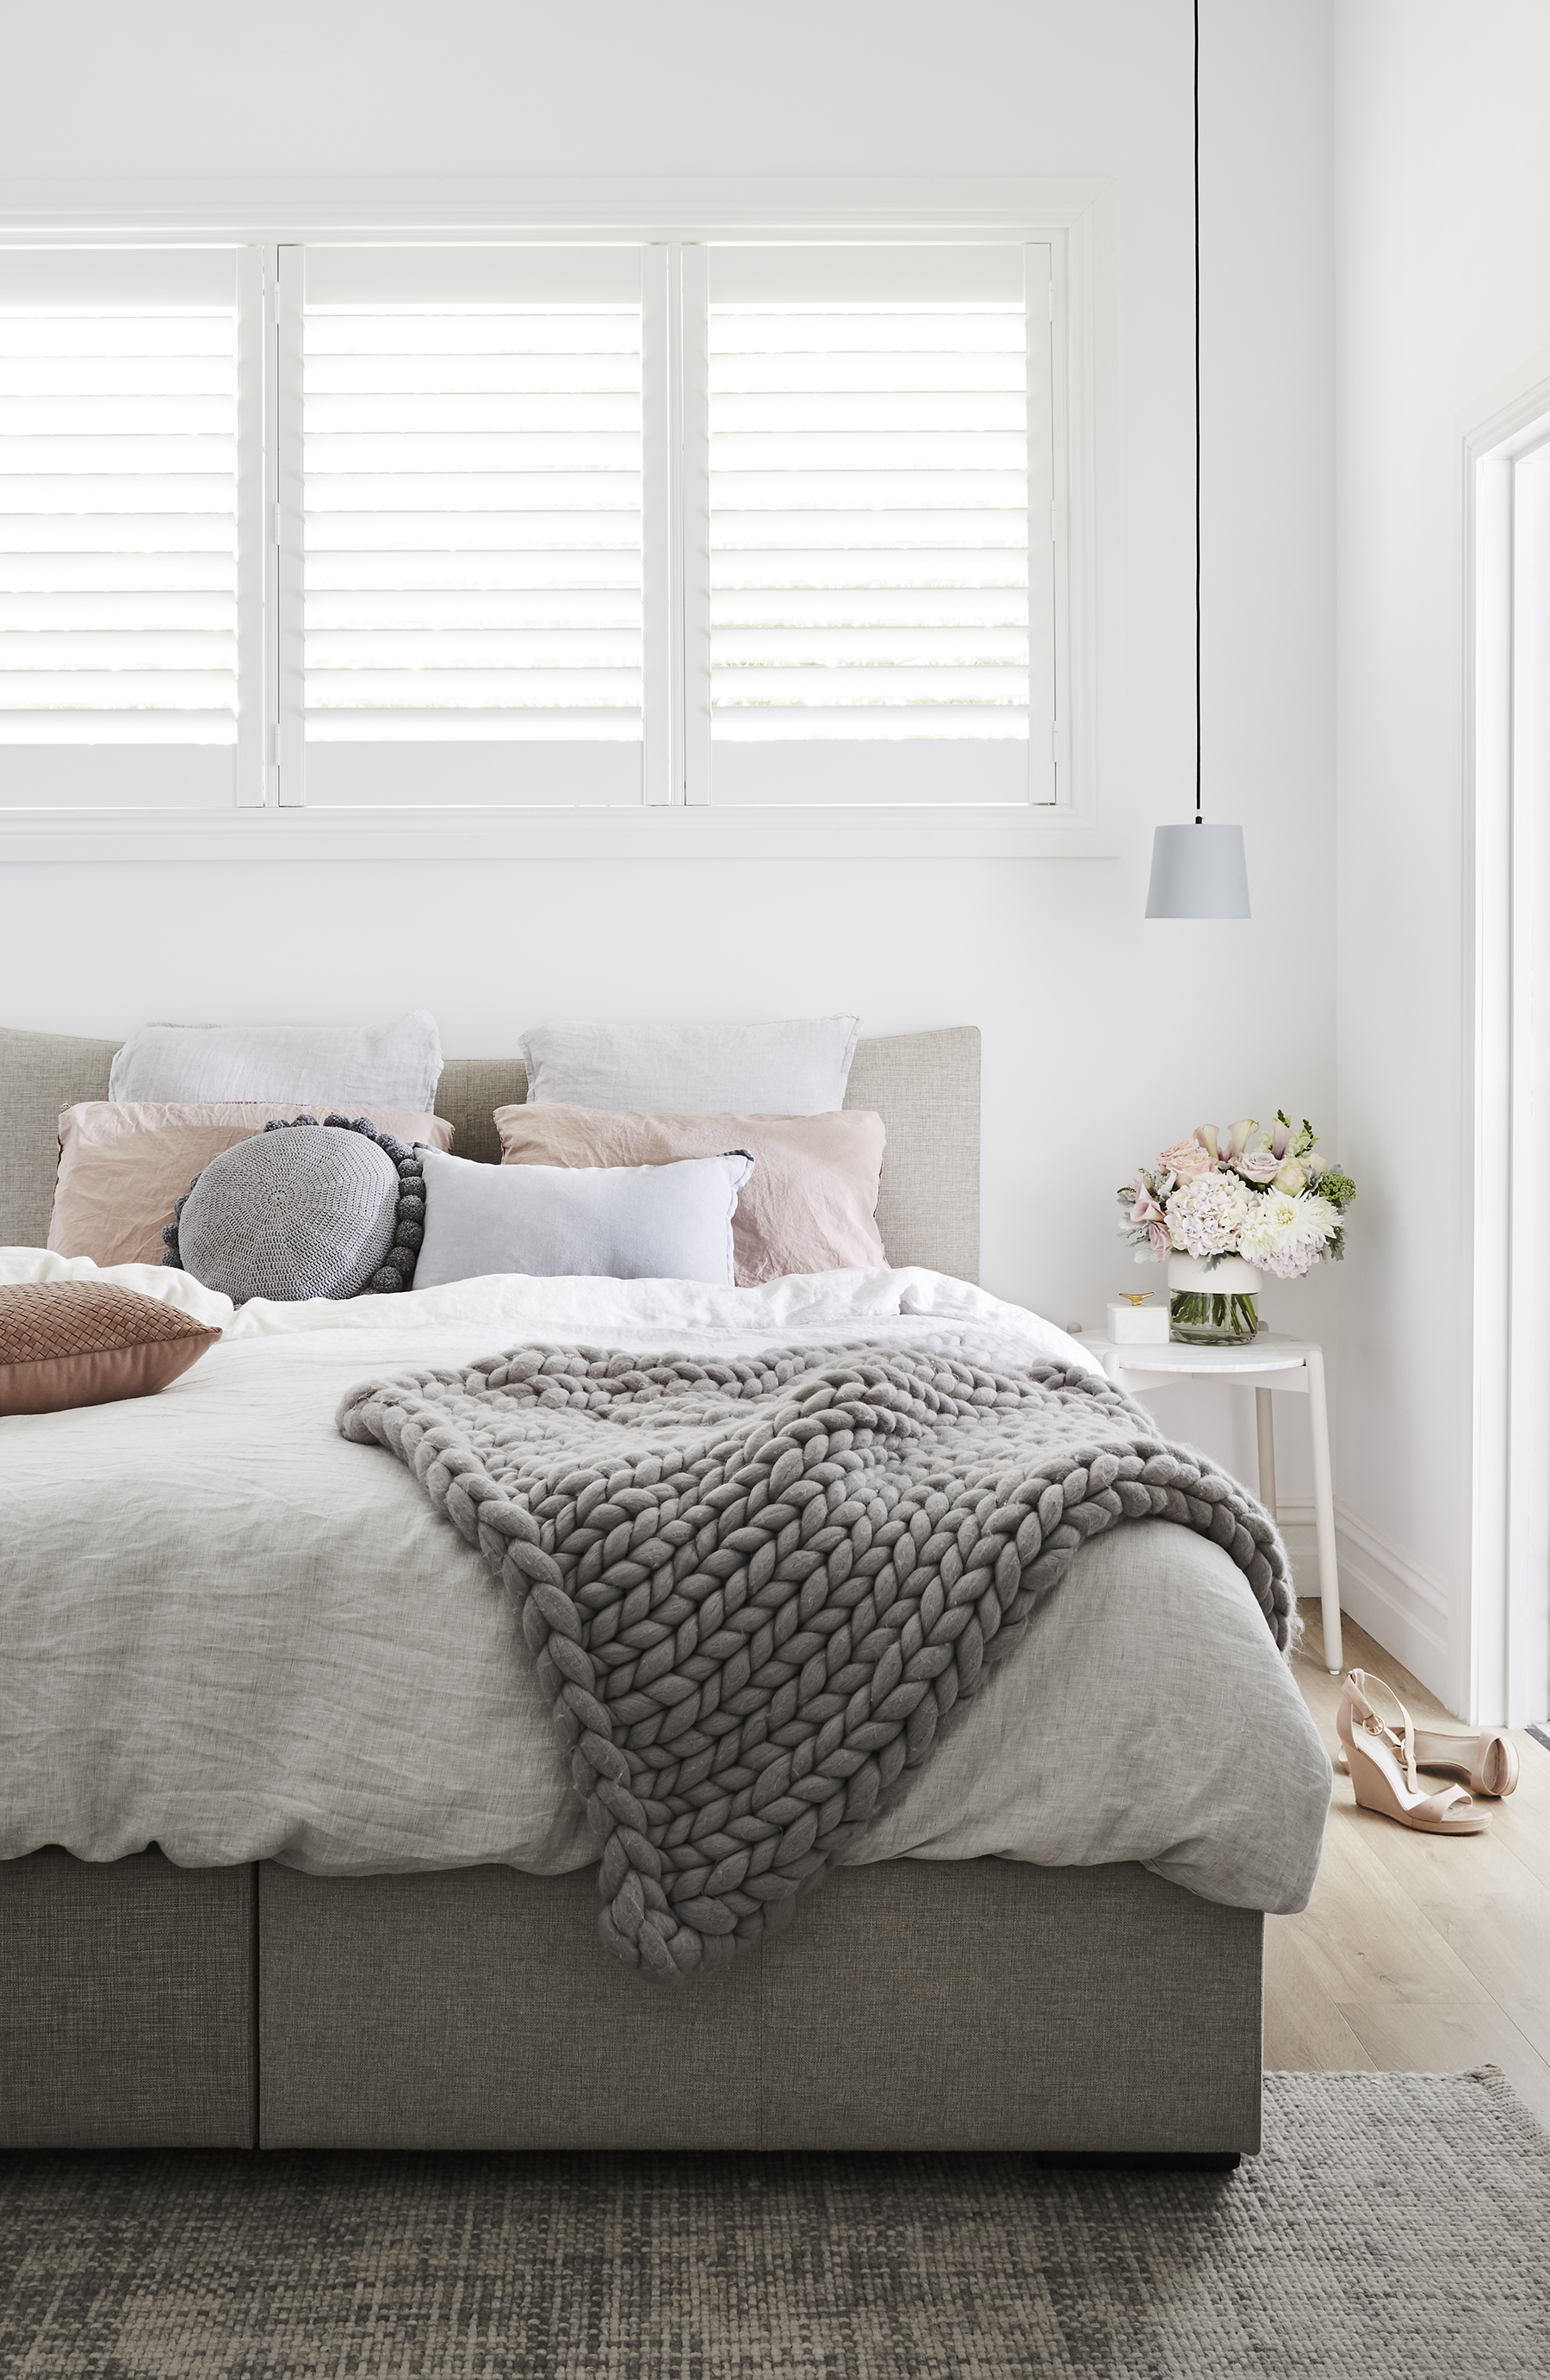 Photography   Annette O'Brien  /  Styling   Alana Langan  /  Interior design   Courtney Leslie